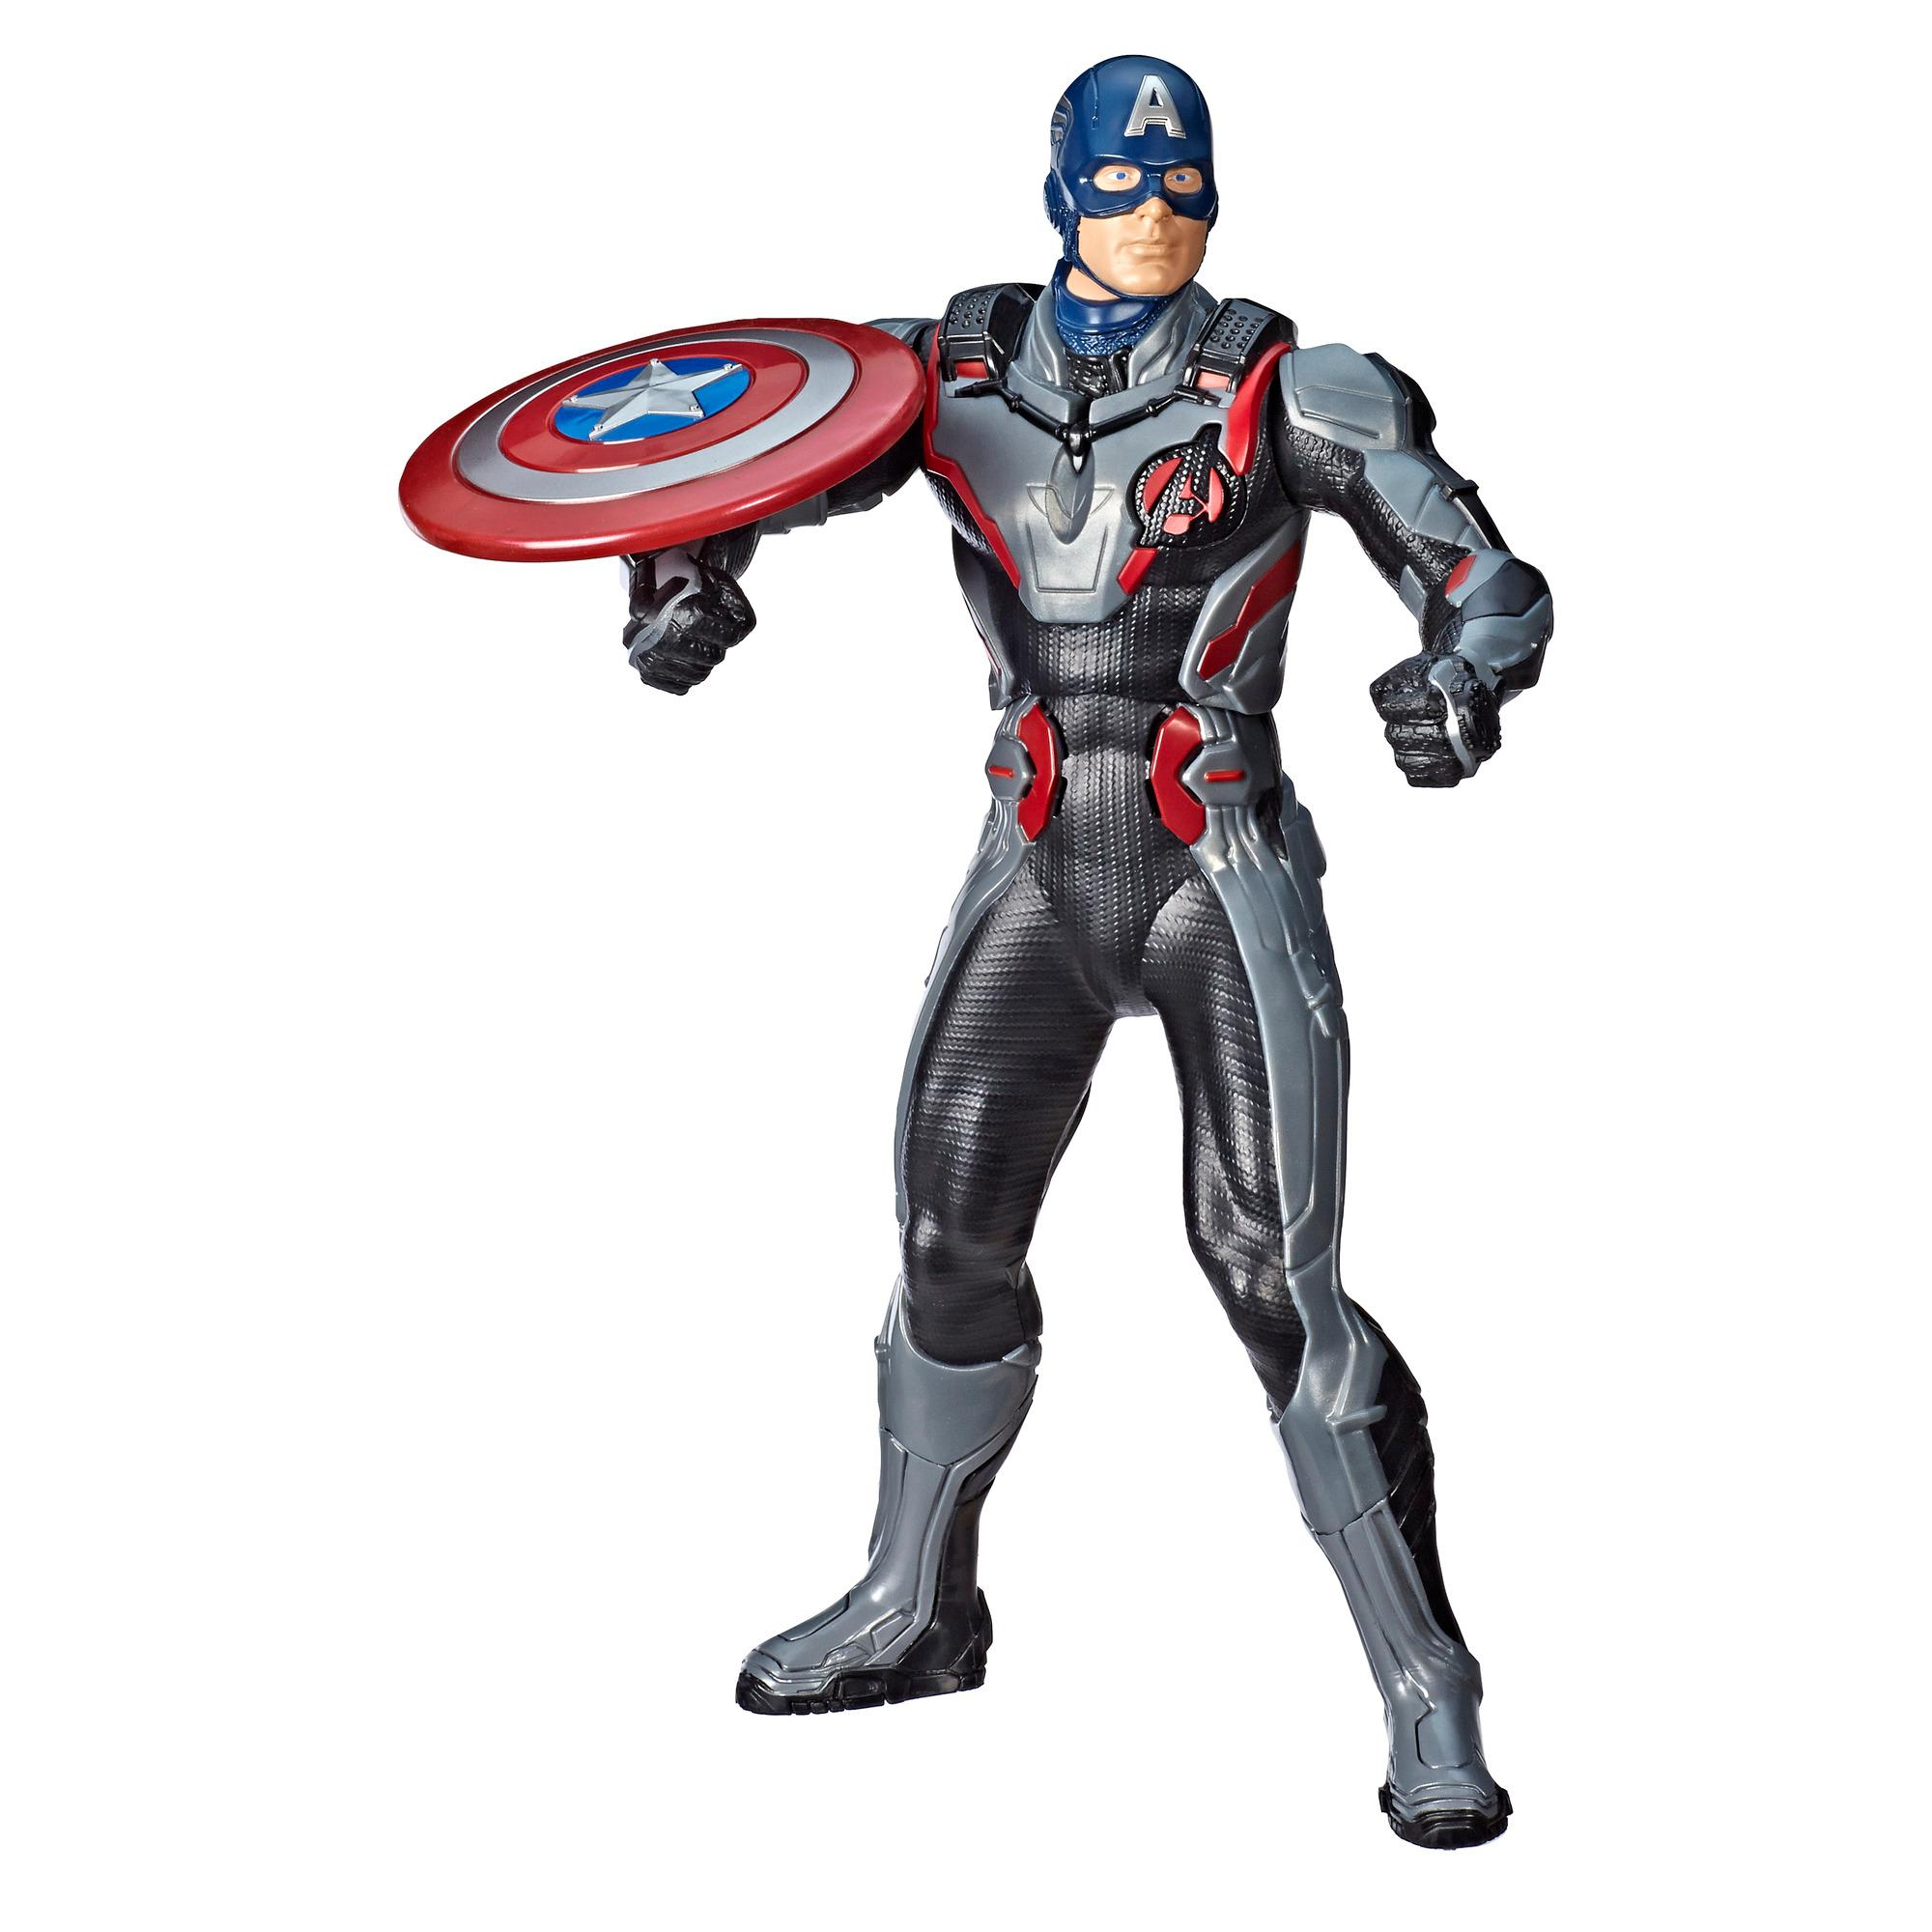 Marvel Avengers: Endgame Schild-Attacke Captain America 33 cm große Action-Figur mit 20+ Sounds und Sätzen